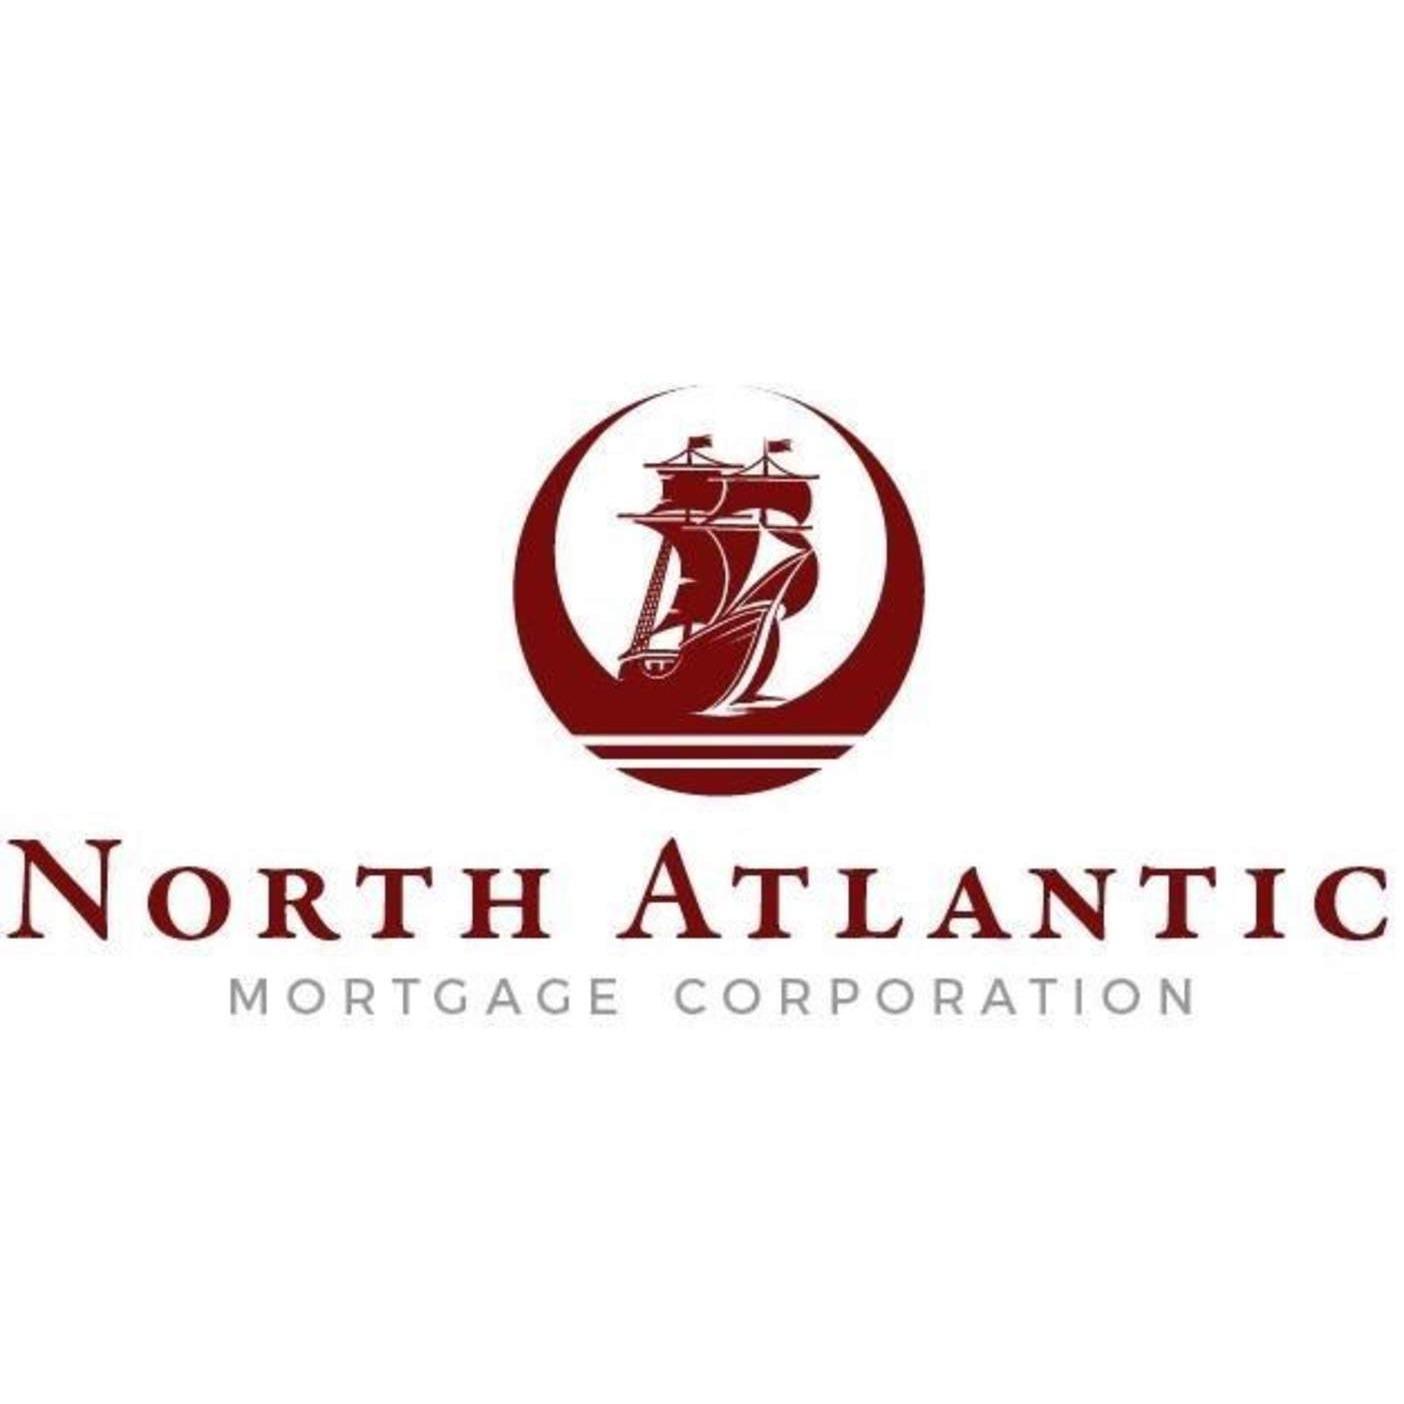 North Atlantic Mortgage Corporation